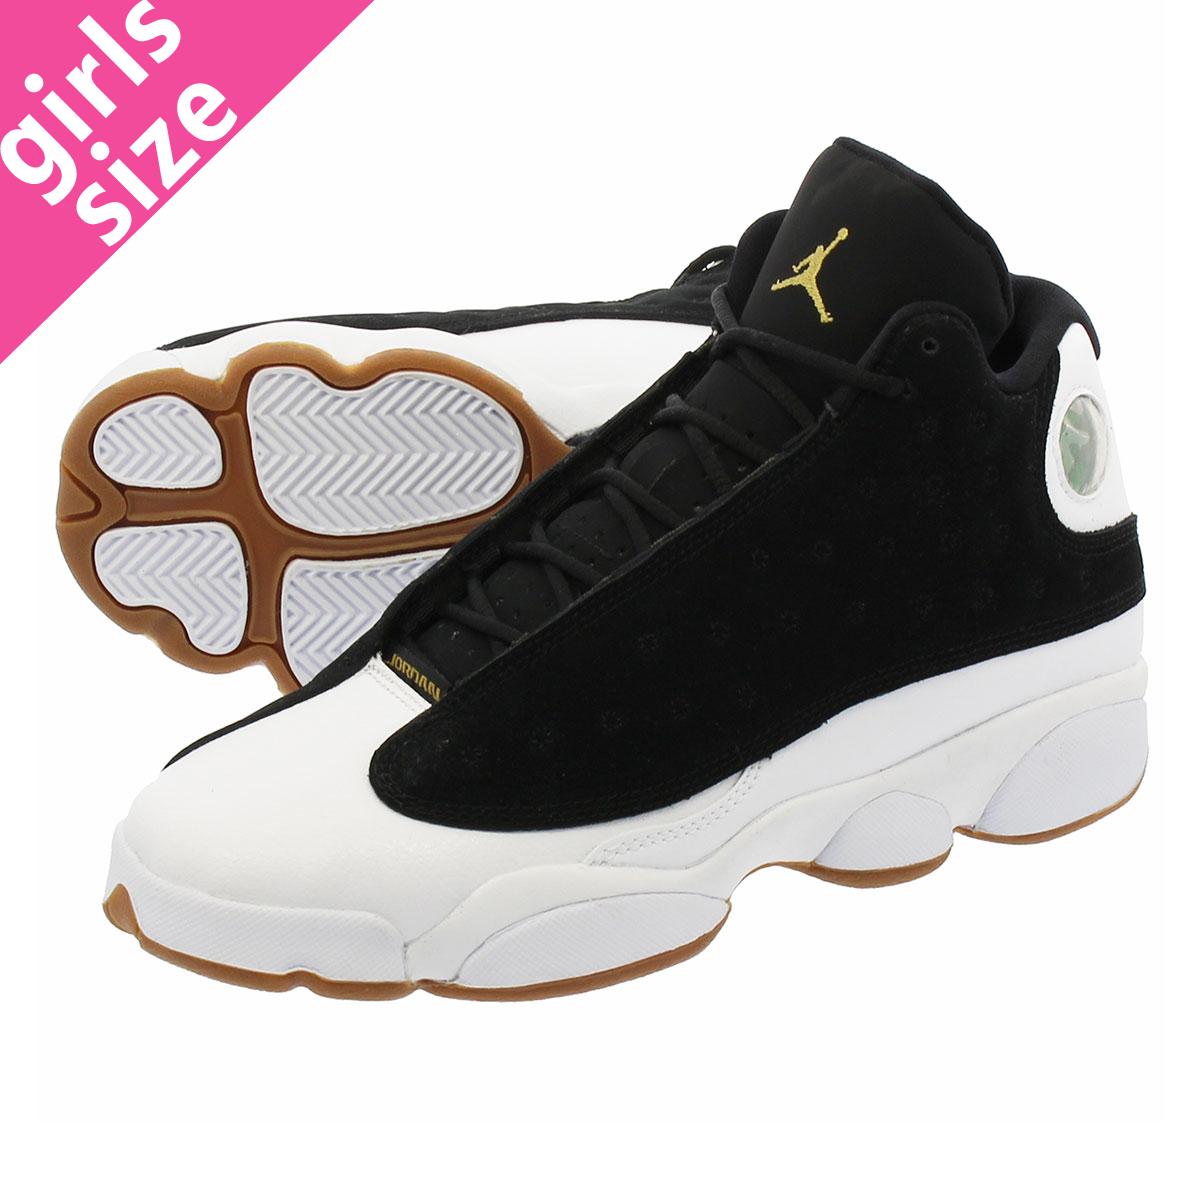 new release preview of popular brand NIKE AIR JORDAN 13 RETRO GG Nike Air Jordan 13 nostalgic GG BLACK/METALLIC  GOLD/WHITE/GUM MED BROWN 439,358-021